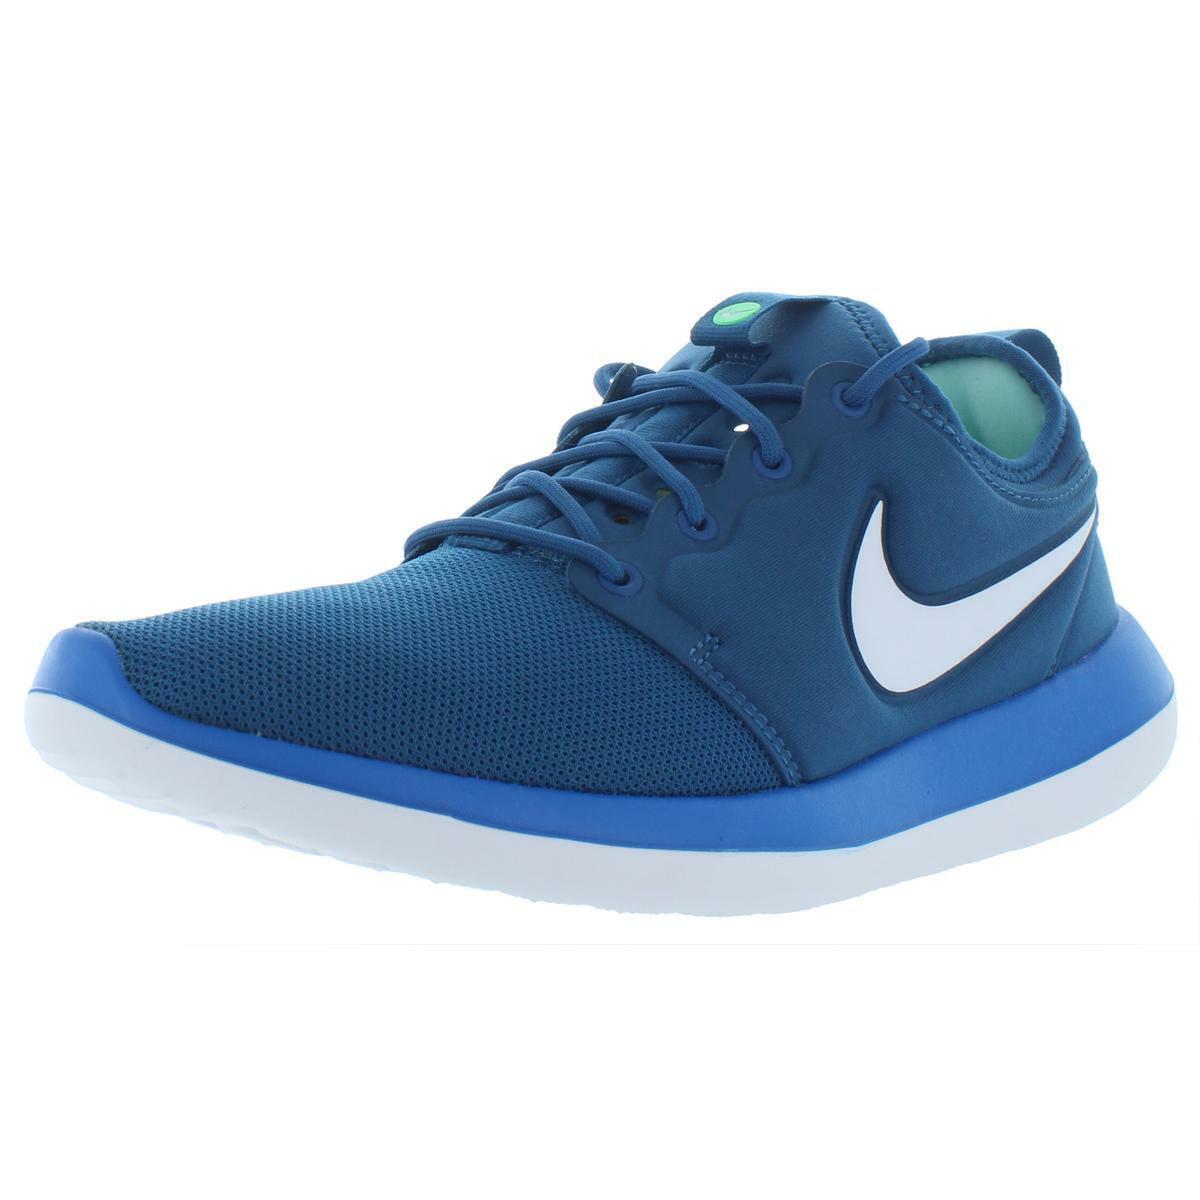 Nike para hombre Roshe Entrenamiento Casual Zapatos Deportivos Perforados Two Zapatillas BHFO 3530